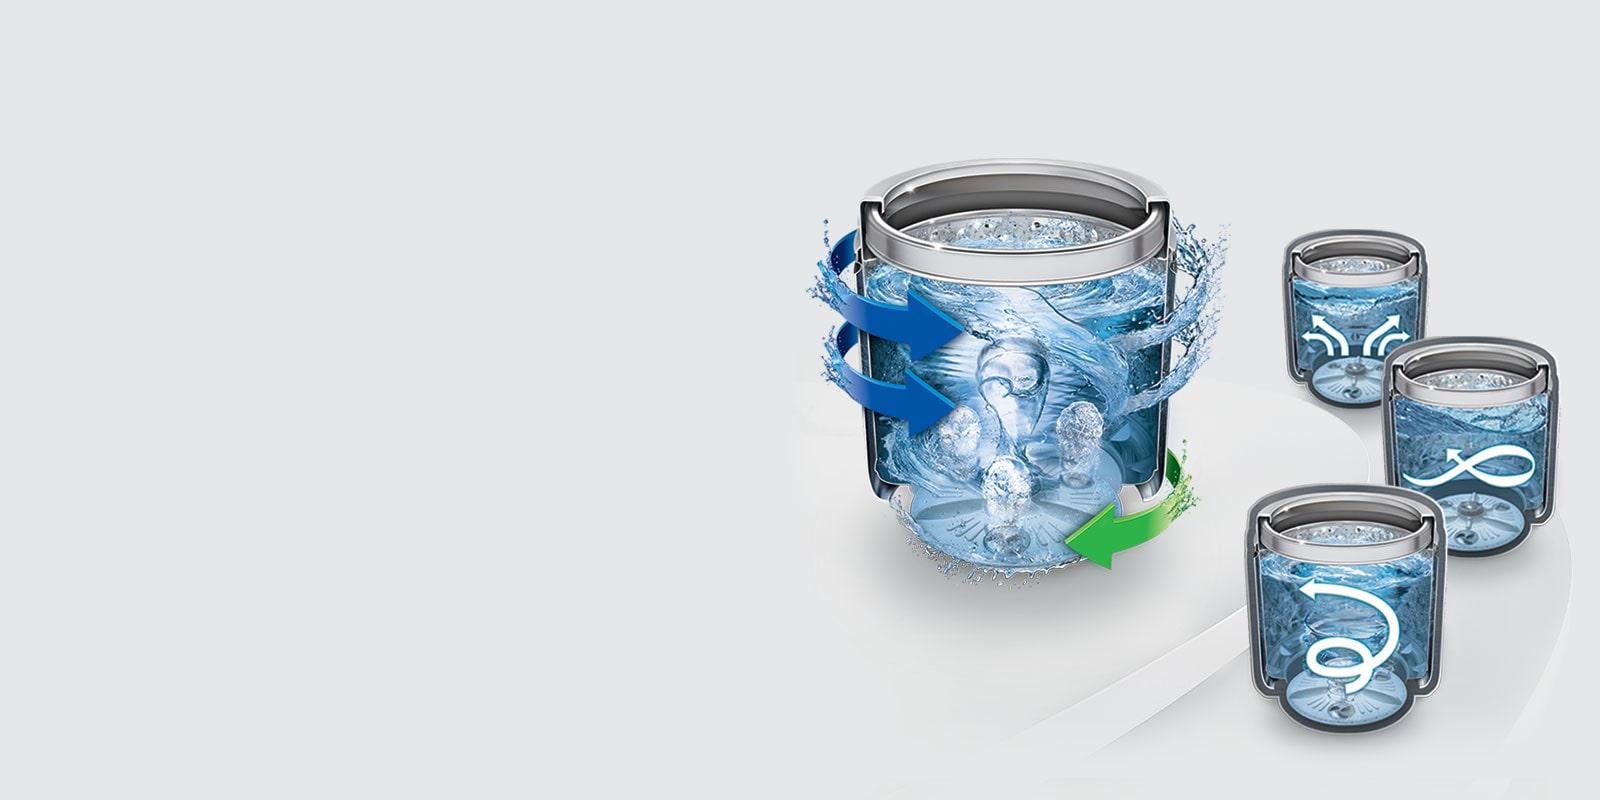 LG T80SJSF1Z 8 kg Turbo Drum